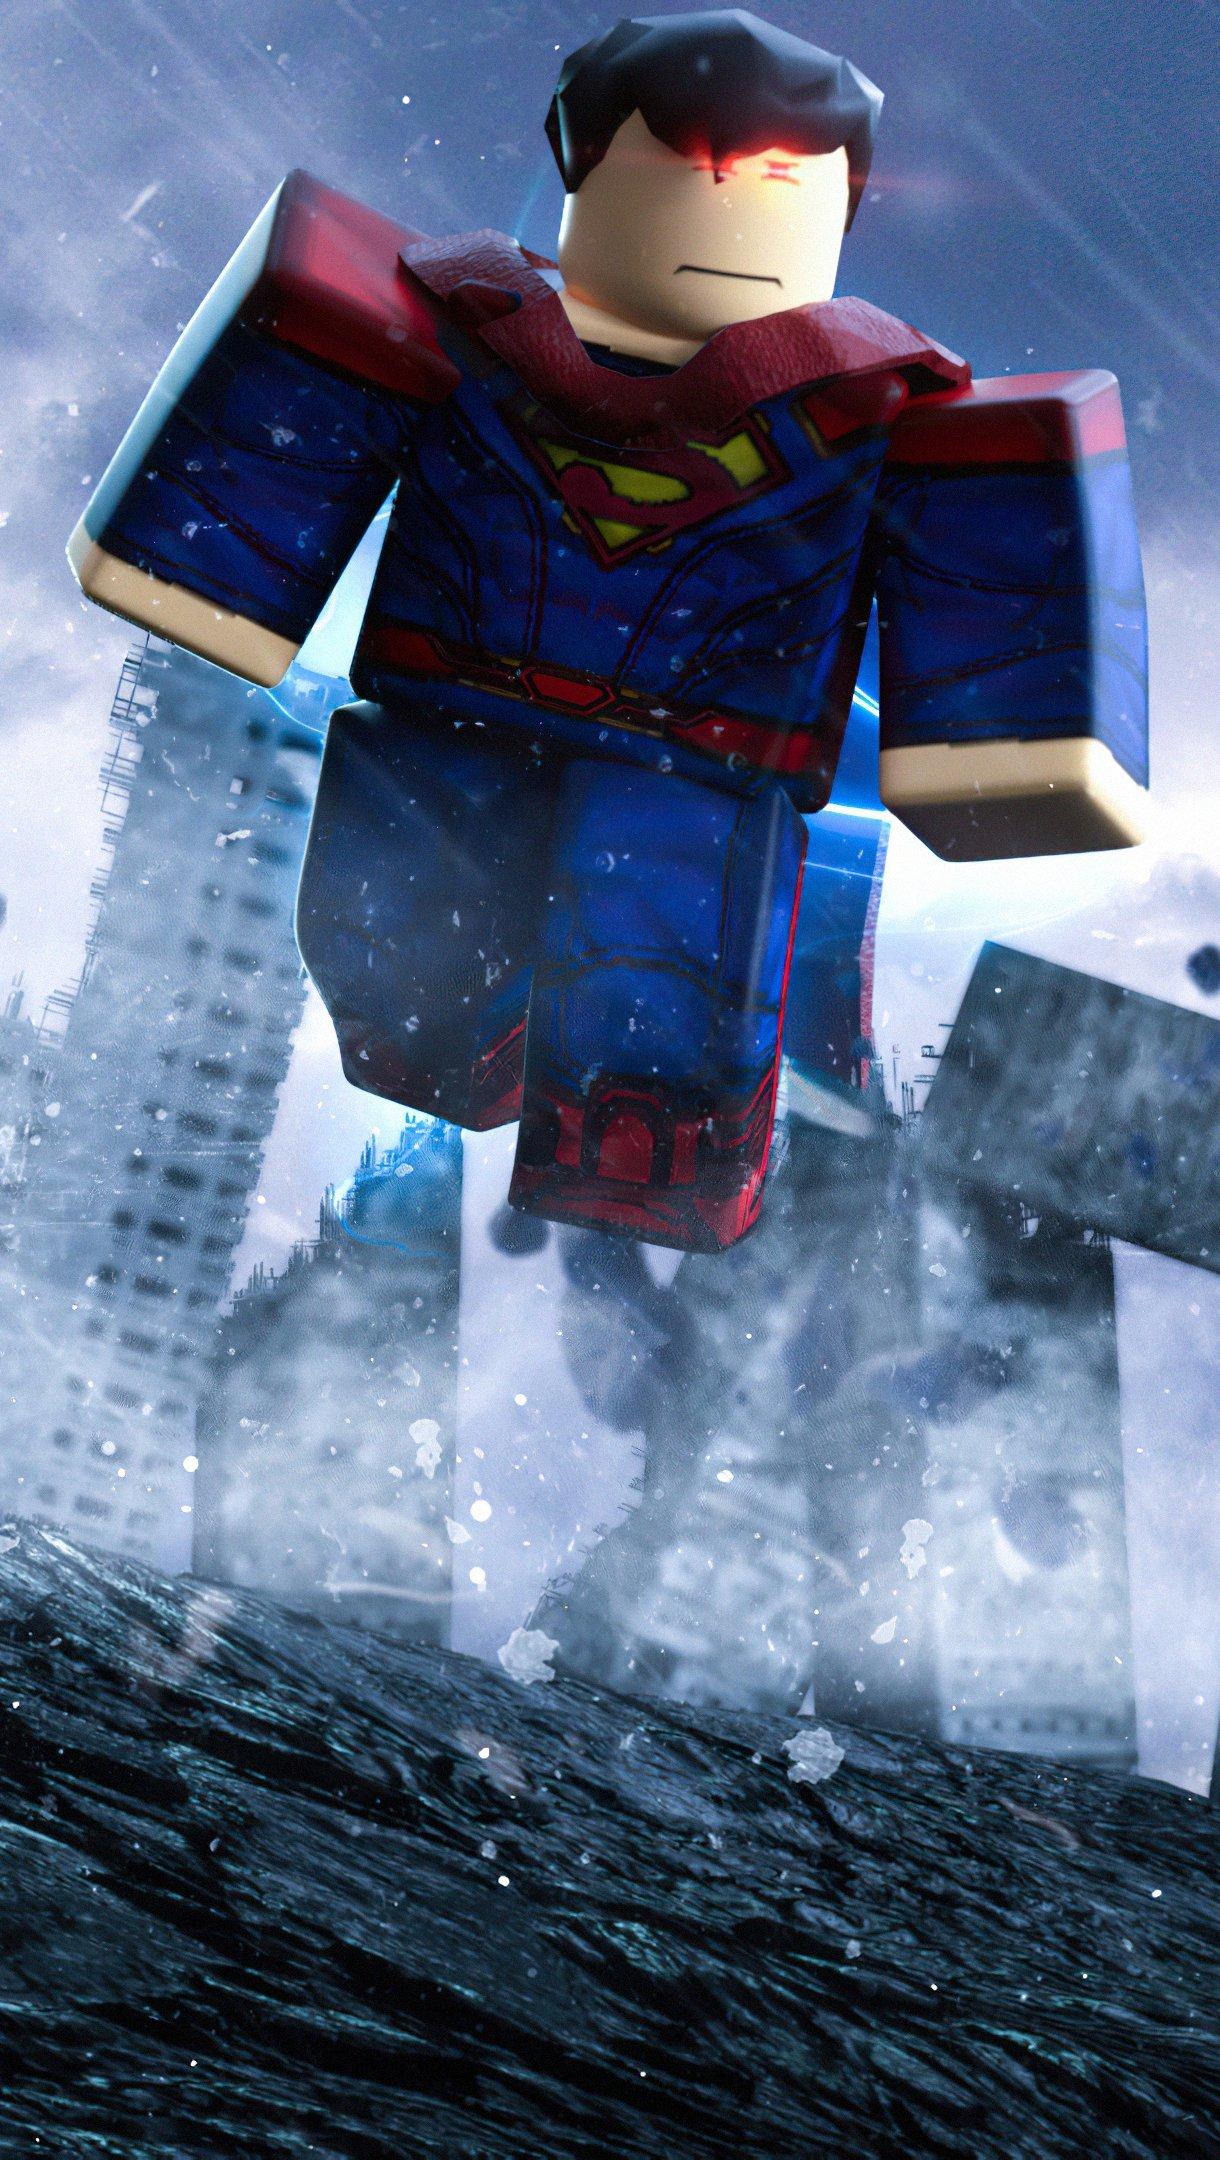 Wallpaper Batman VS Superman Lego style Vertical